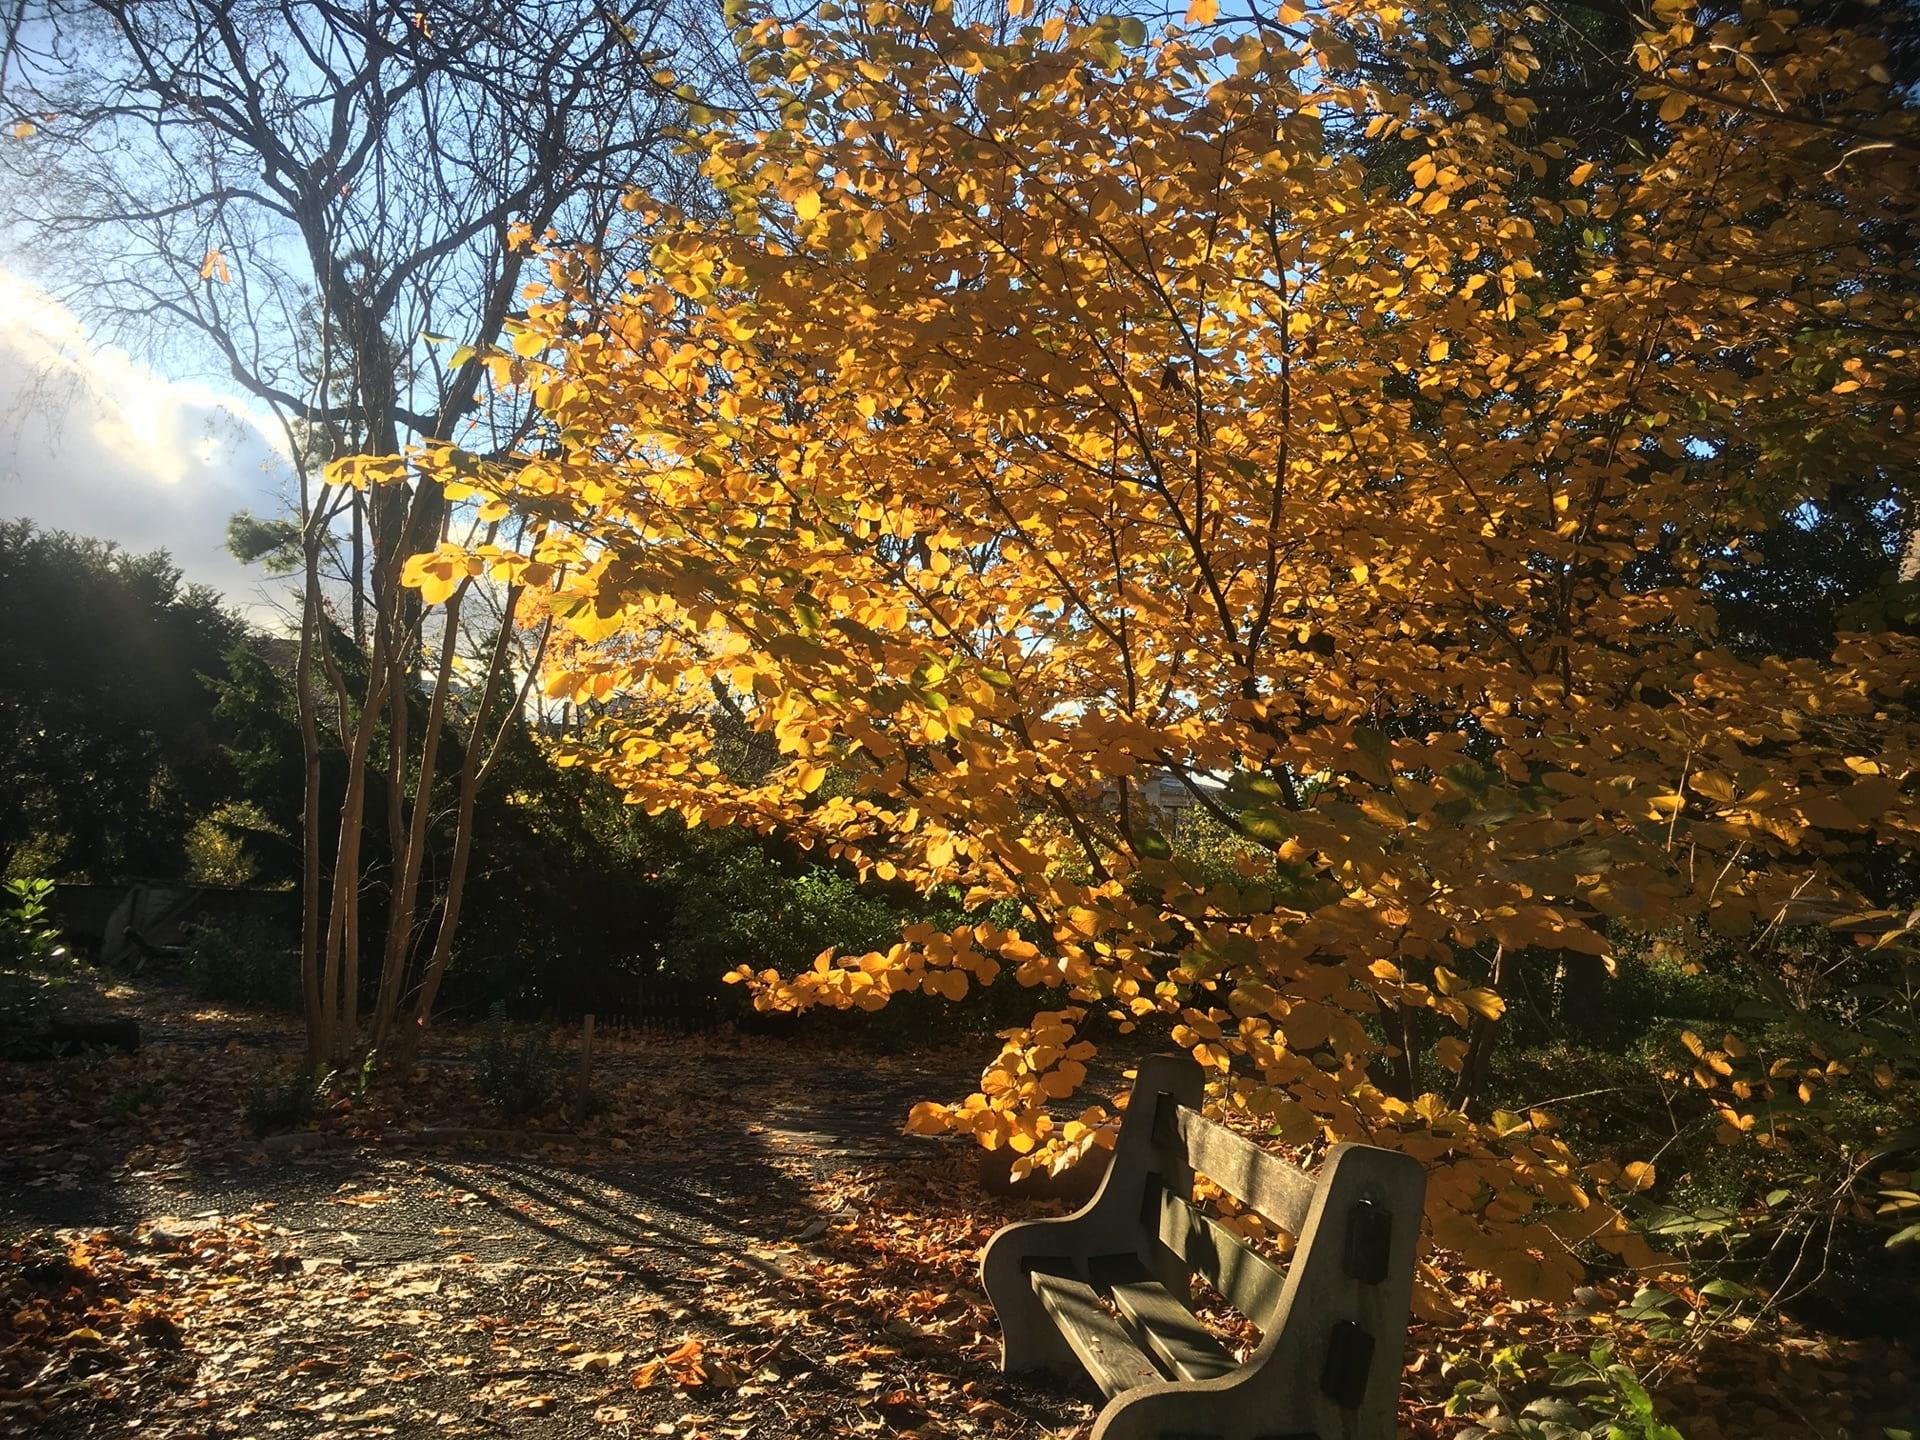 A good spot to soak up the sun and enjoy the fall color of Hamamelis mollis.